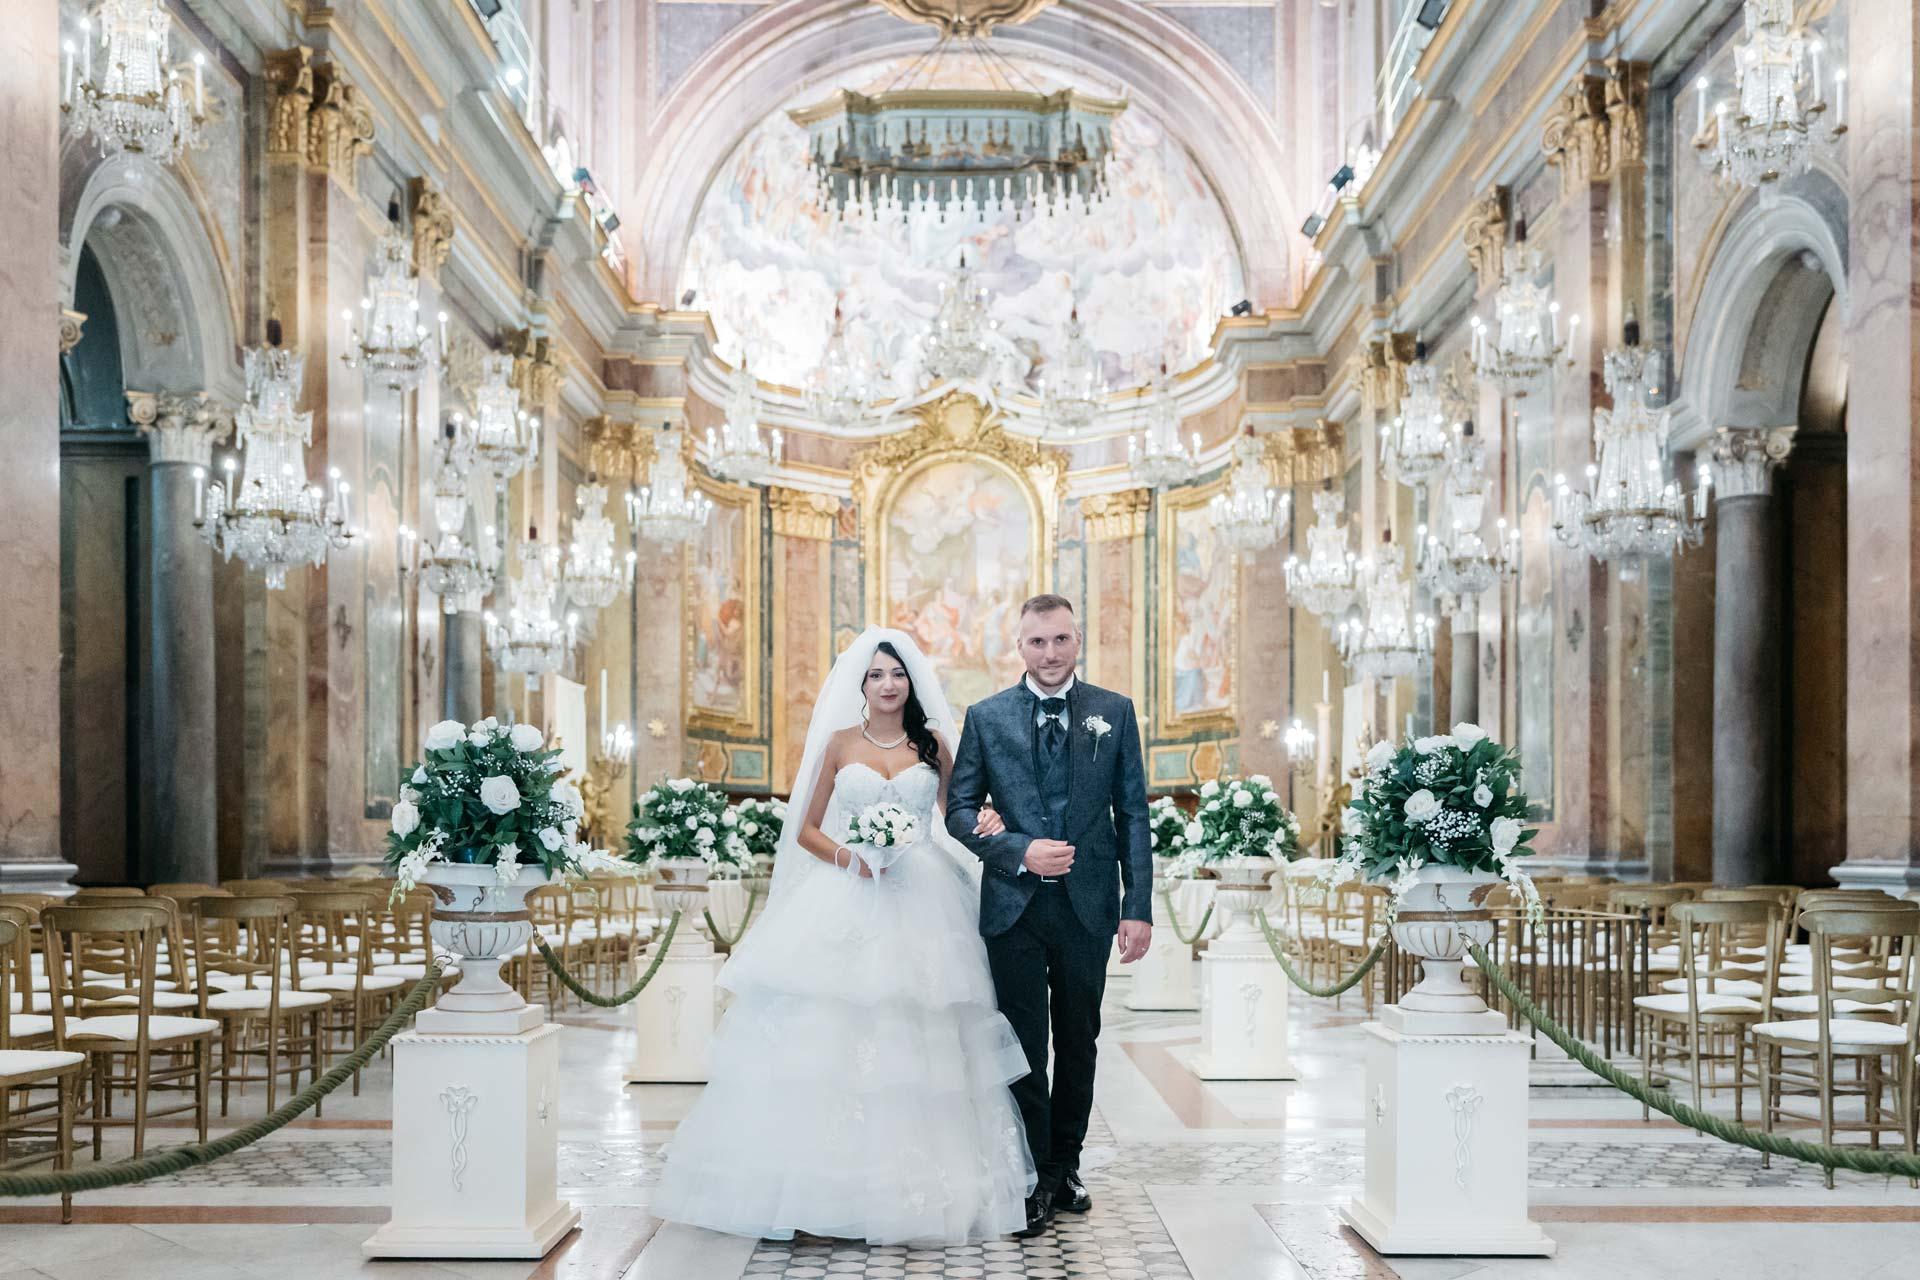 foto-matrimonio-spontanee-basilica-santi-giovanni-e-paolo-simone-nunzi